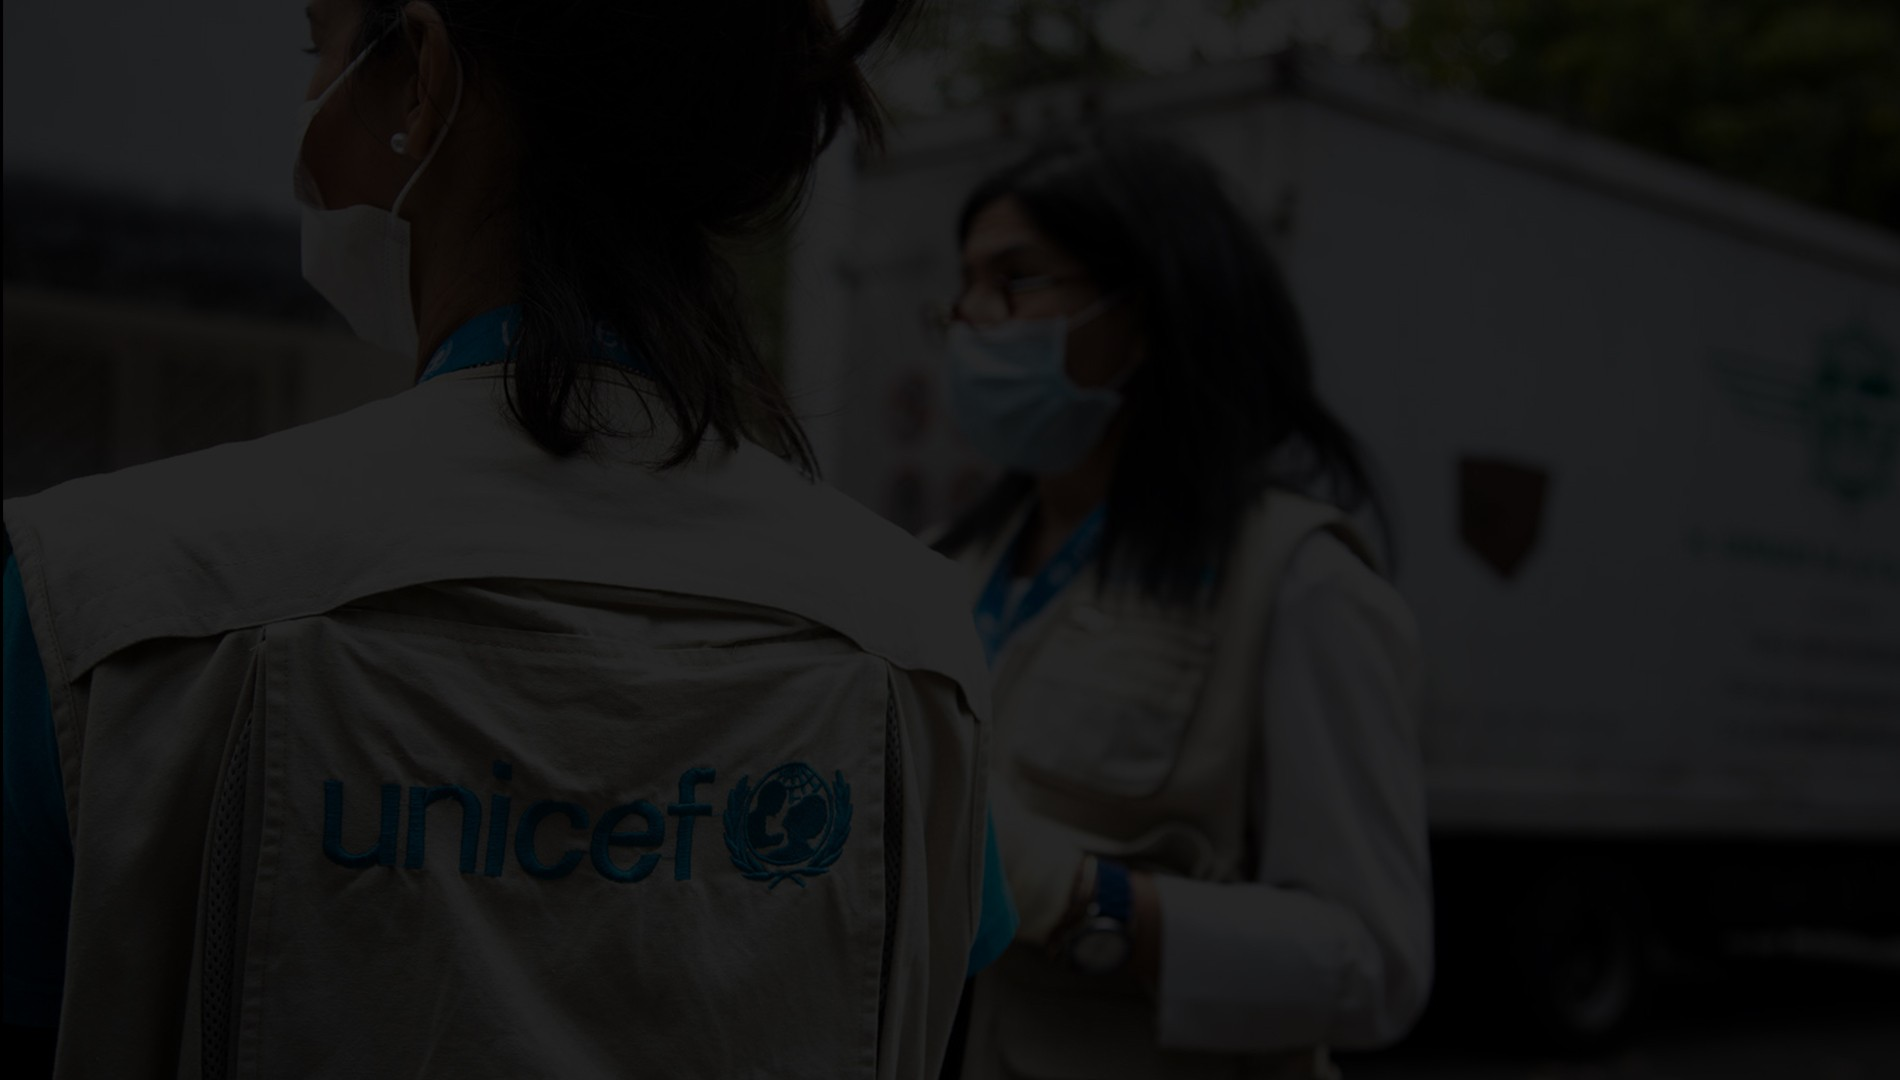 UNICEF-Koronawirus-LP-ikony-bg.jpg